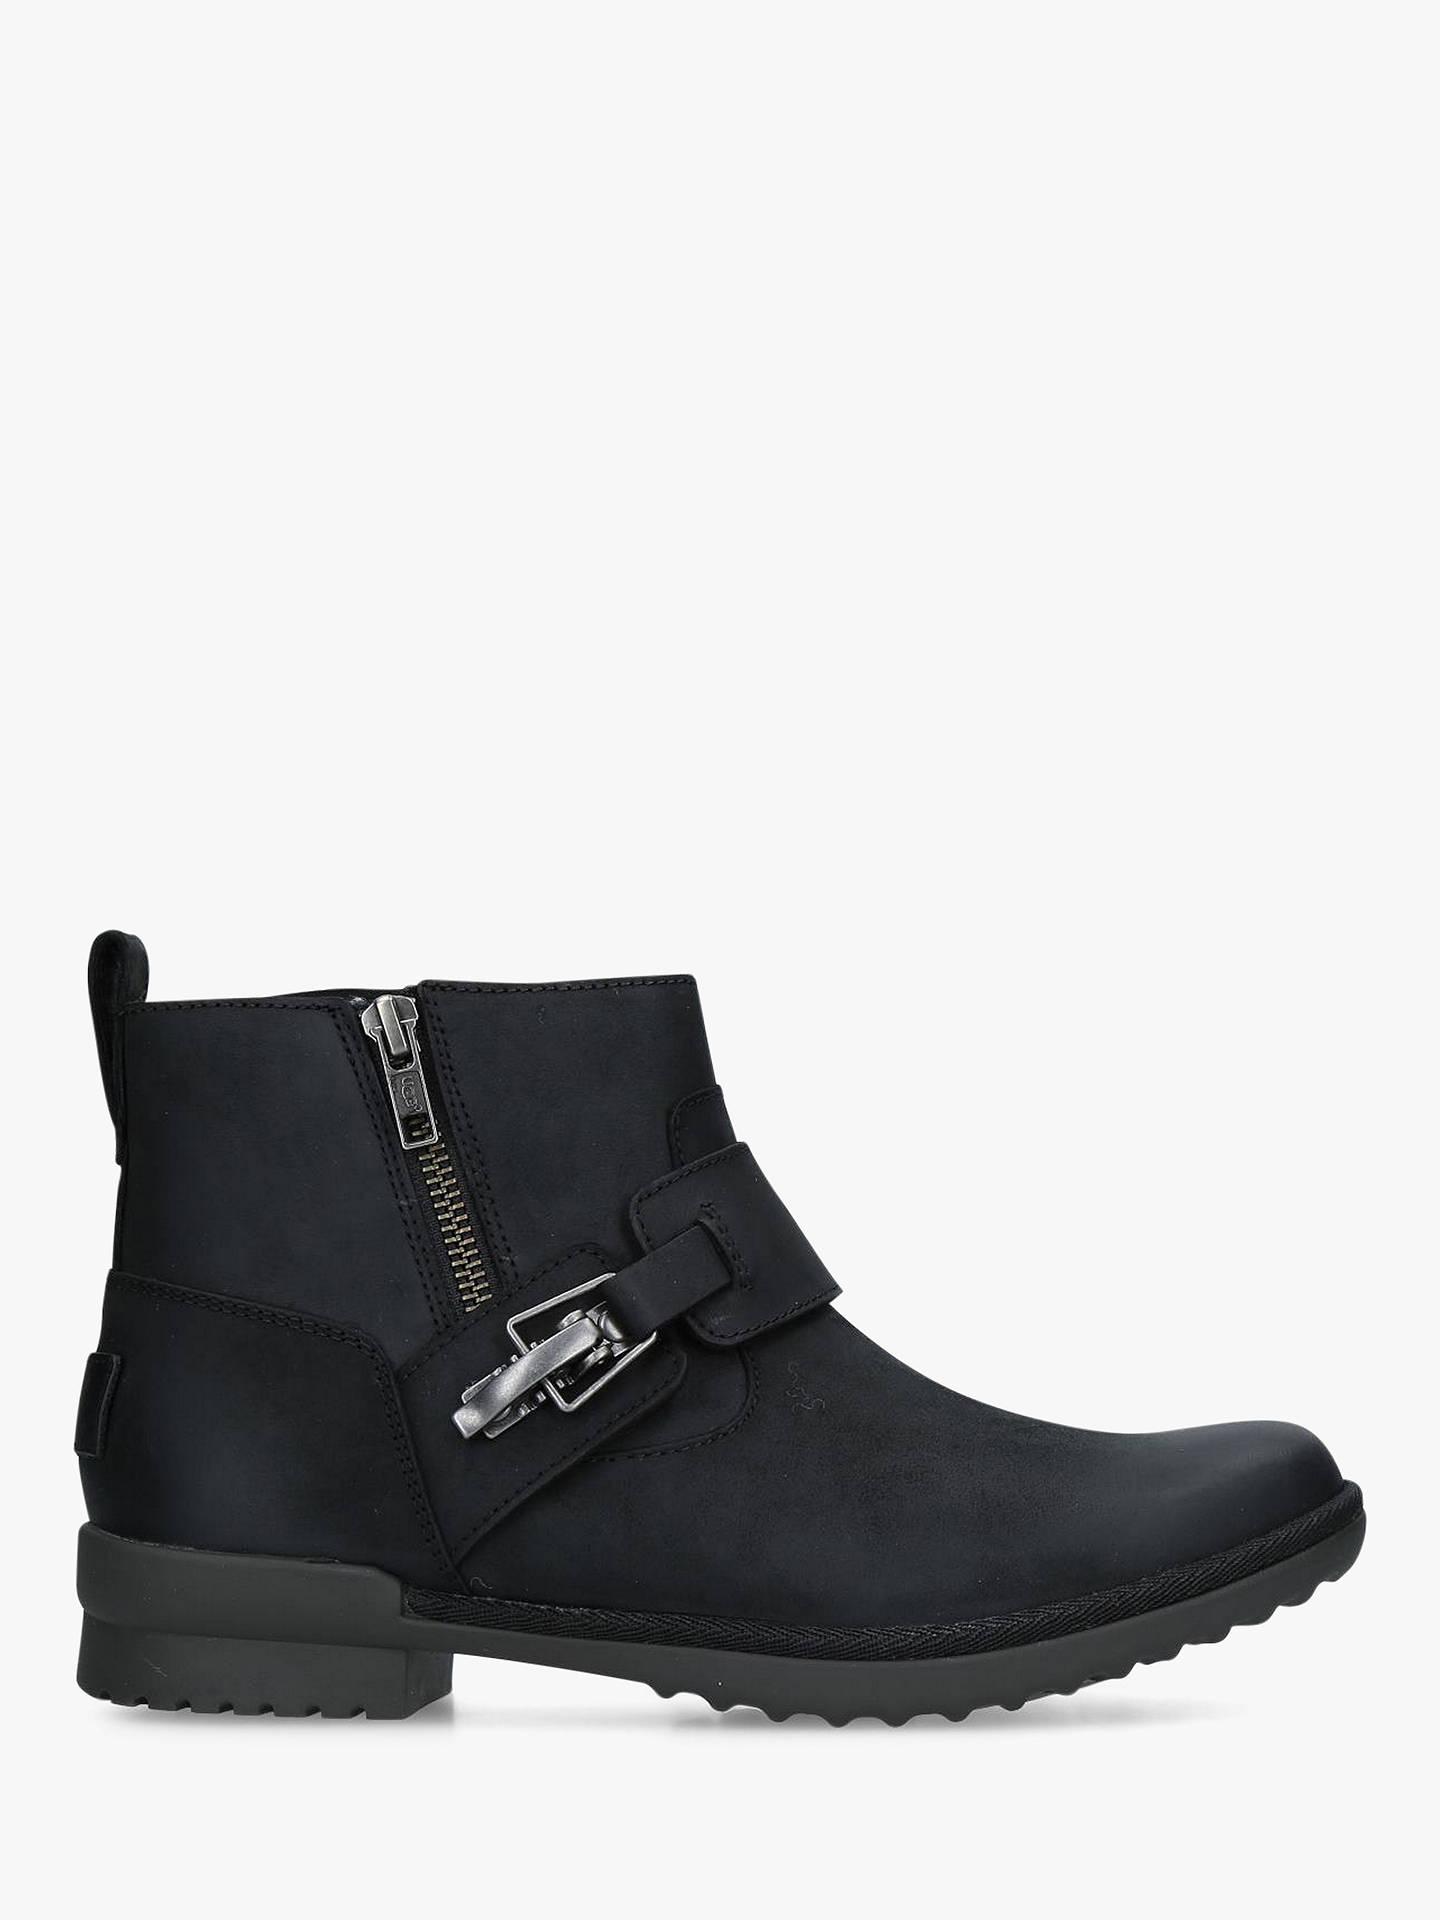 abf617d3b2e UGG Cheyne Waterproof Low Block Heel Ankle Boots at John Lewis ...